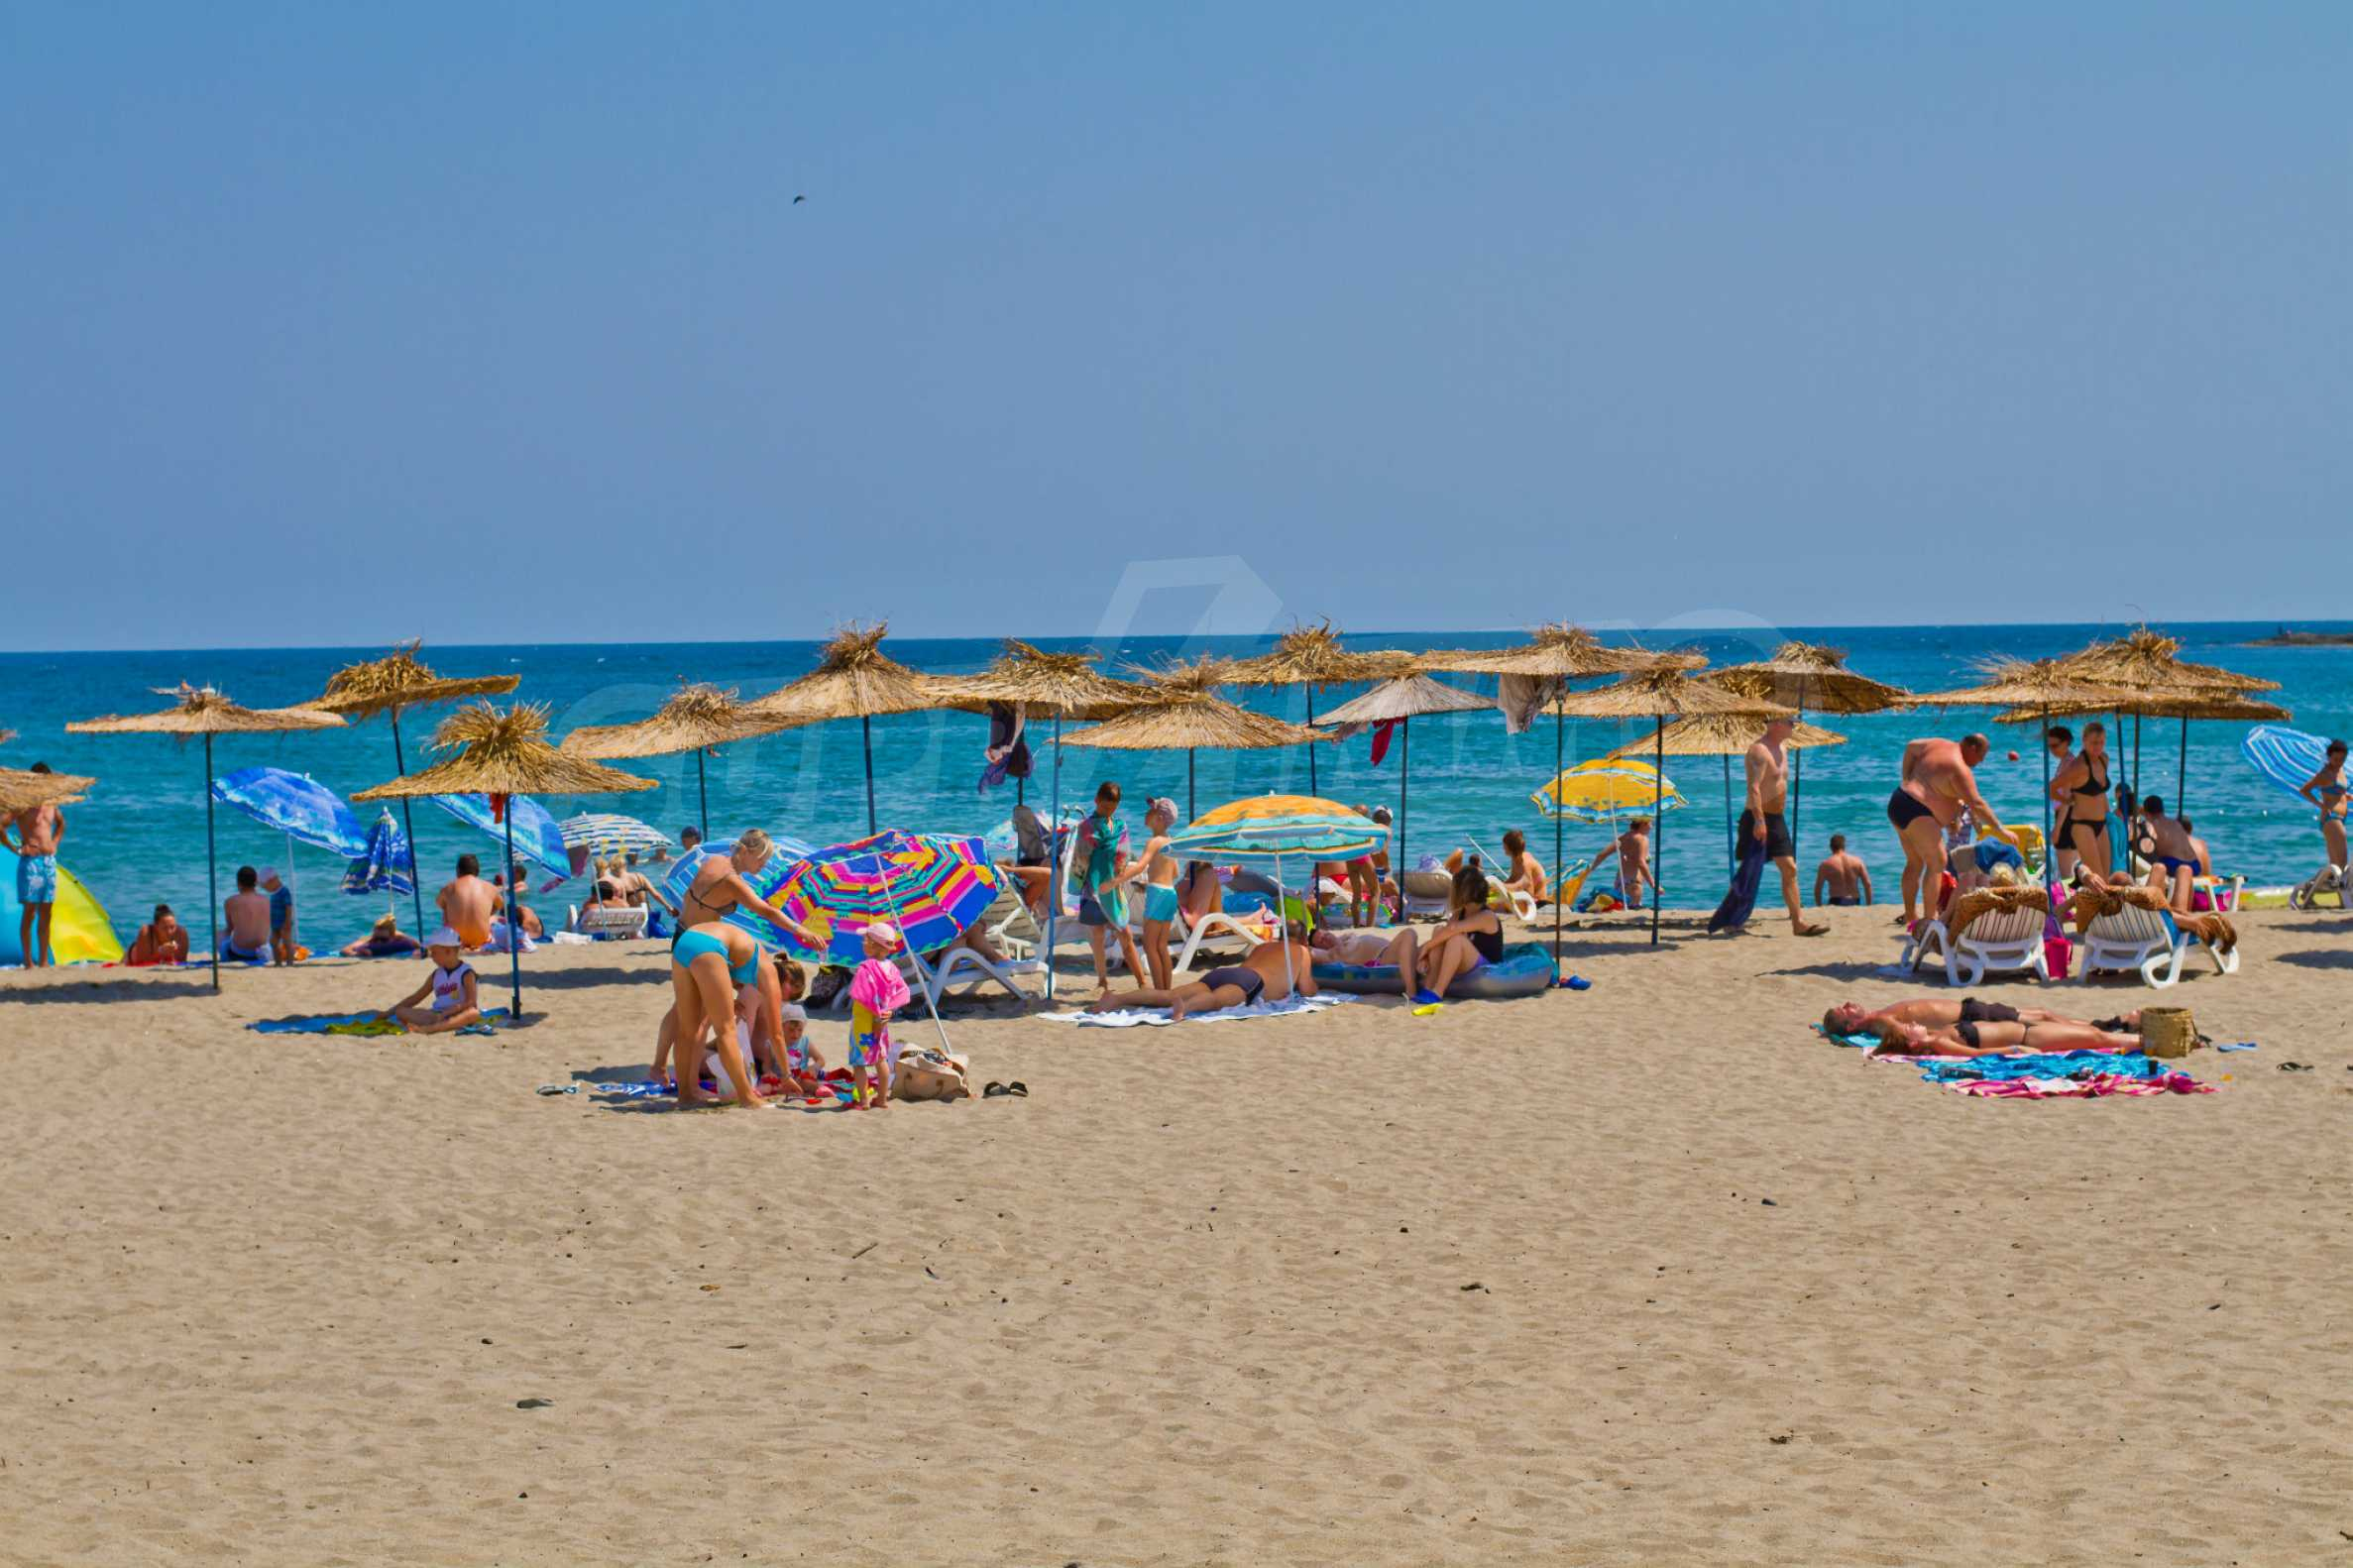 Примеа Бийч Резиденс / Primea Beach Residence 12